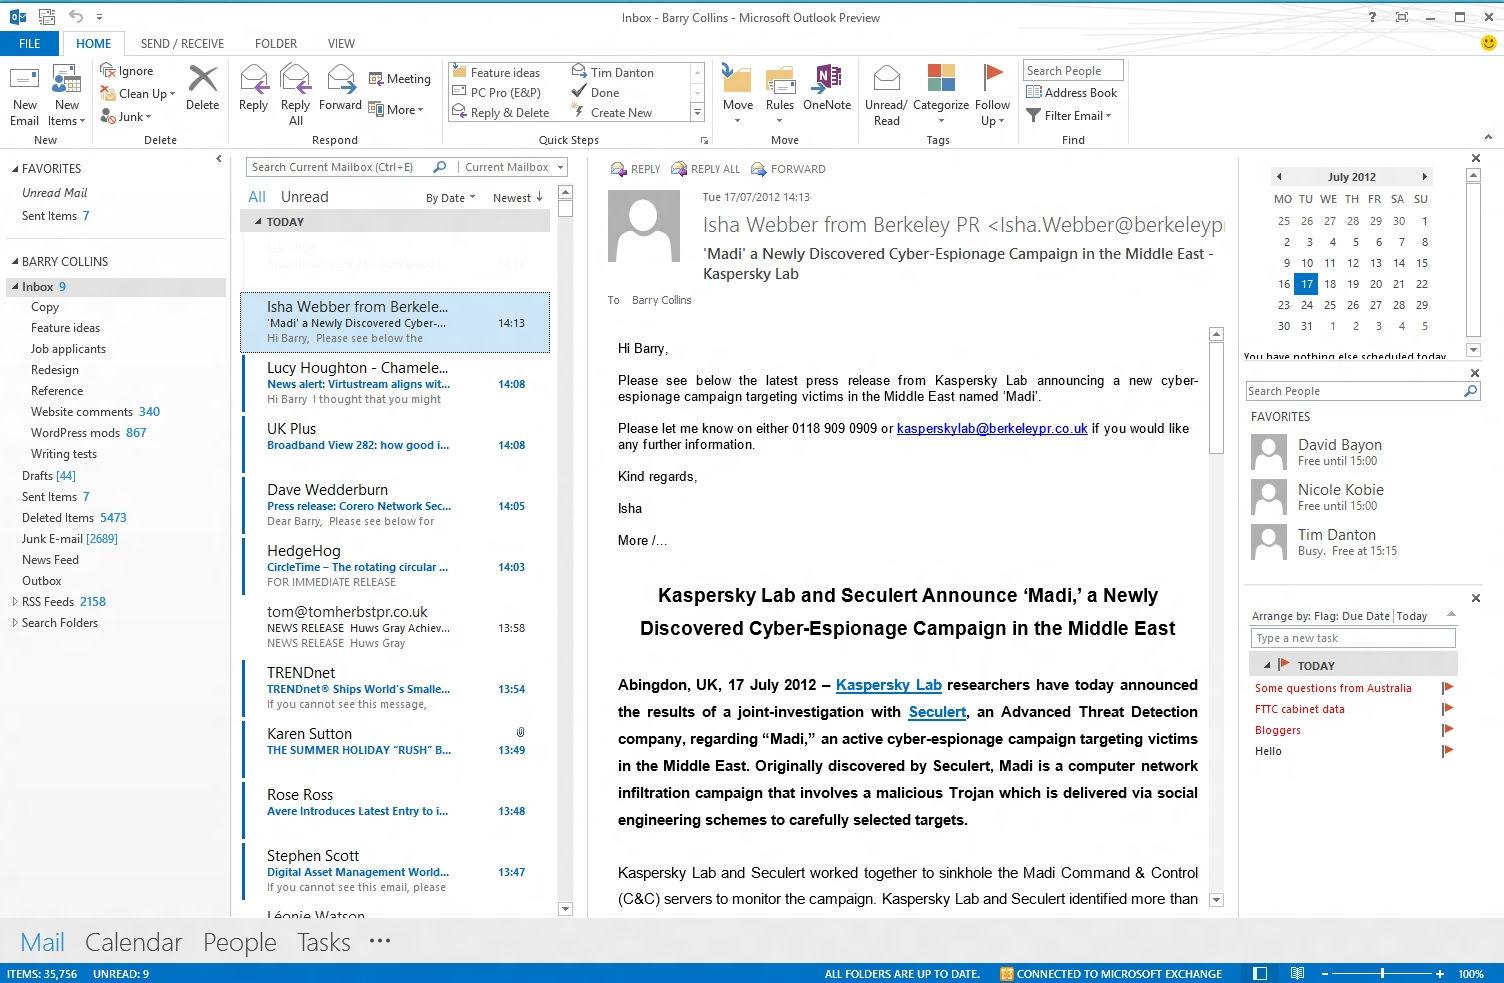 Interfaz del Outlook 2014